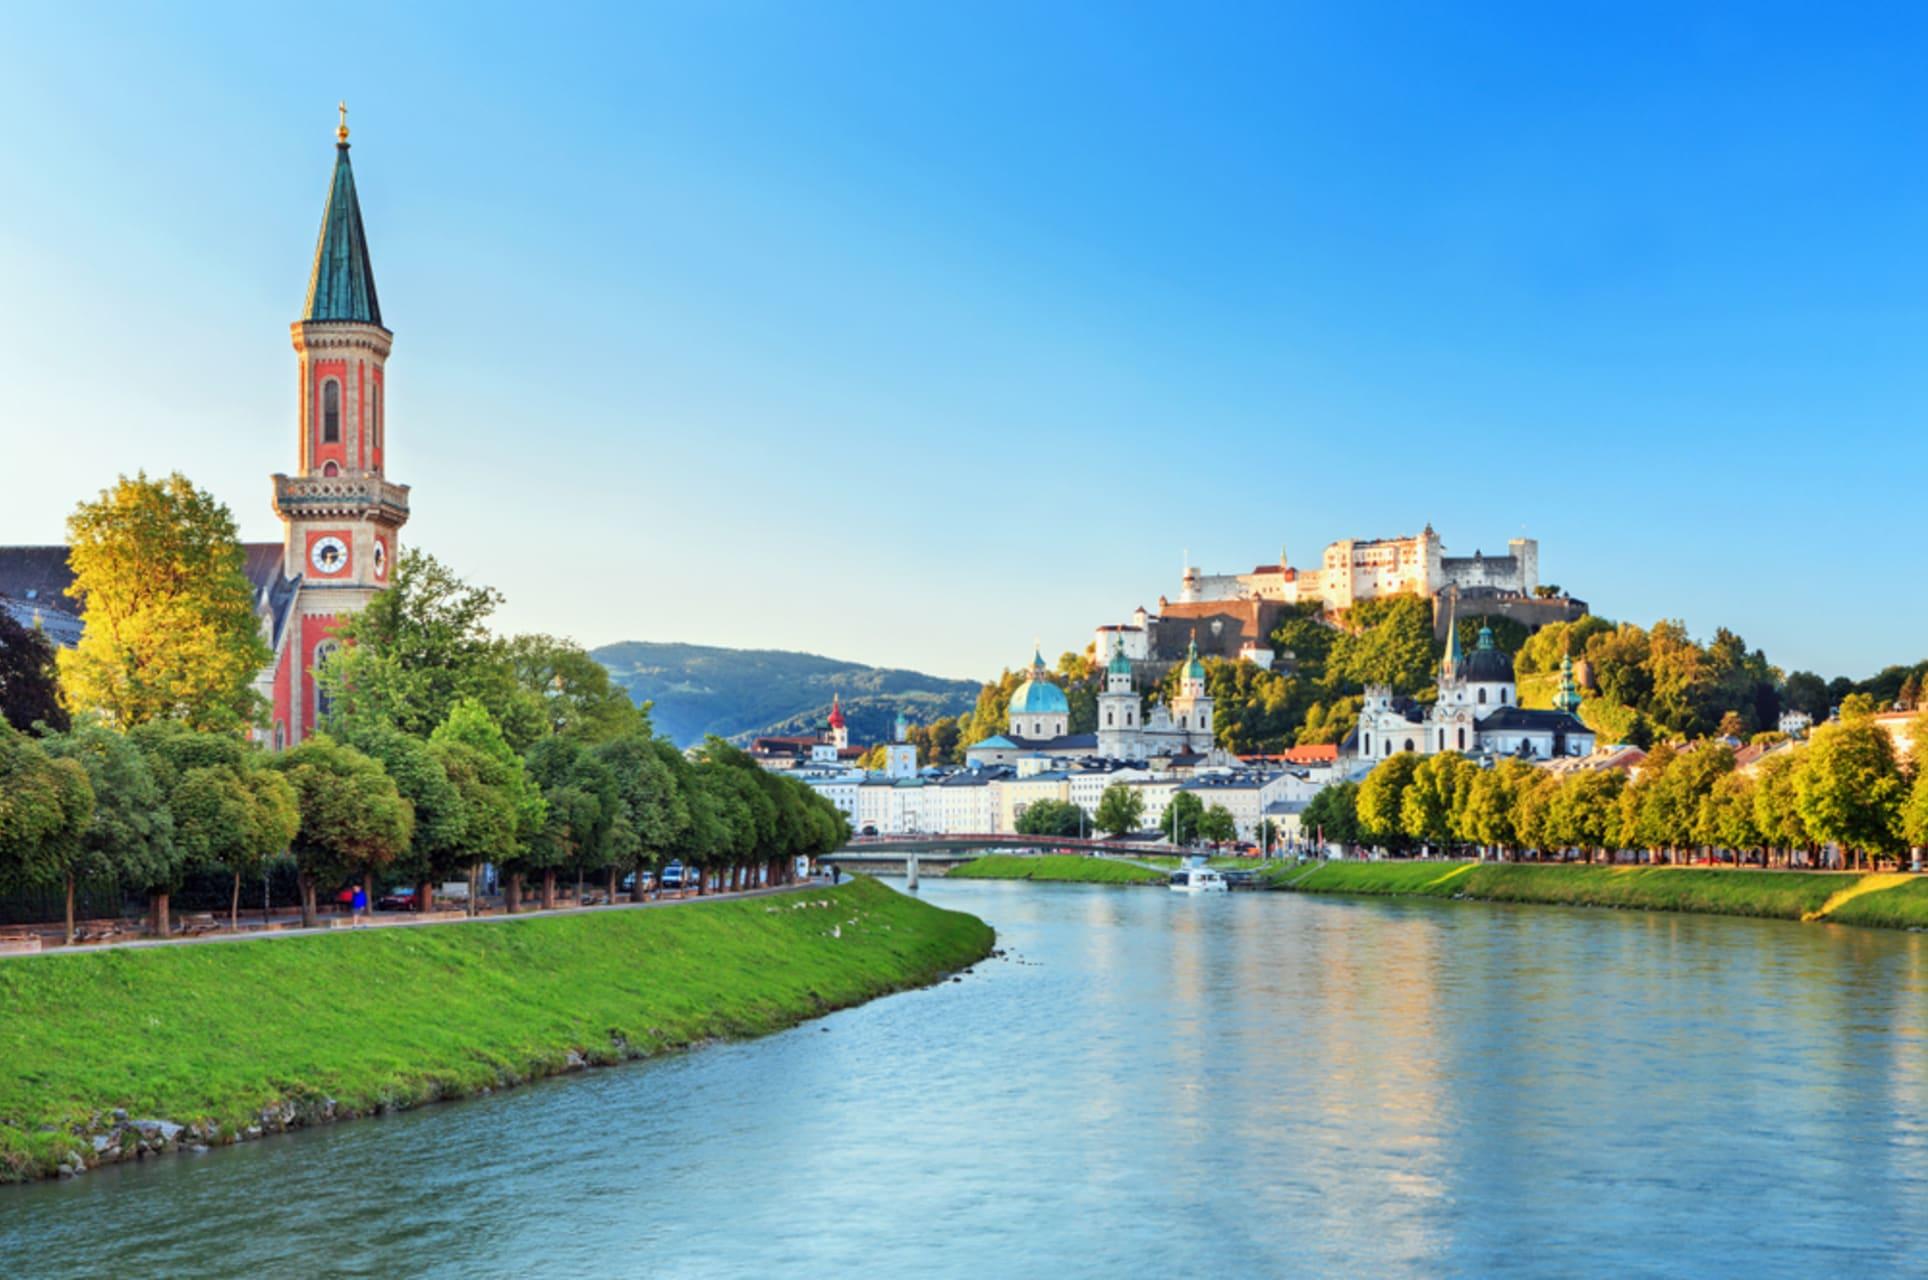 Salzburg - Salzburg's Fairytale Old Town